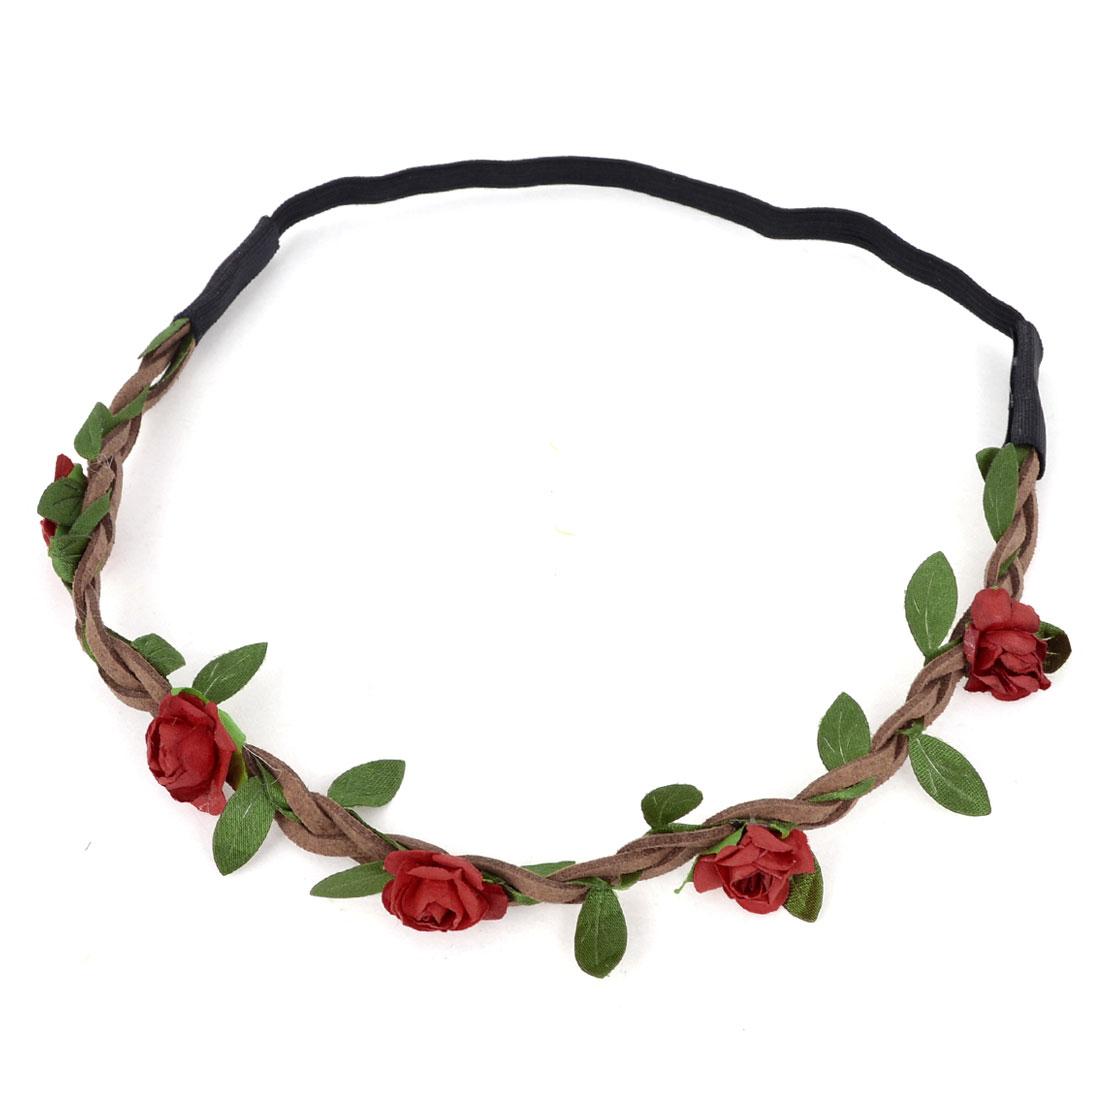 Women Hairdressing Elastic Braided Strap Floral Design Headwear Hairband